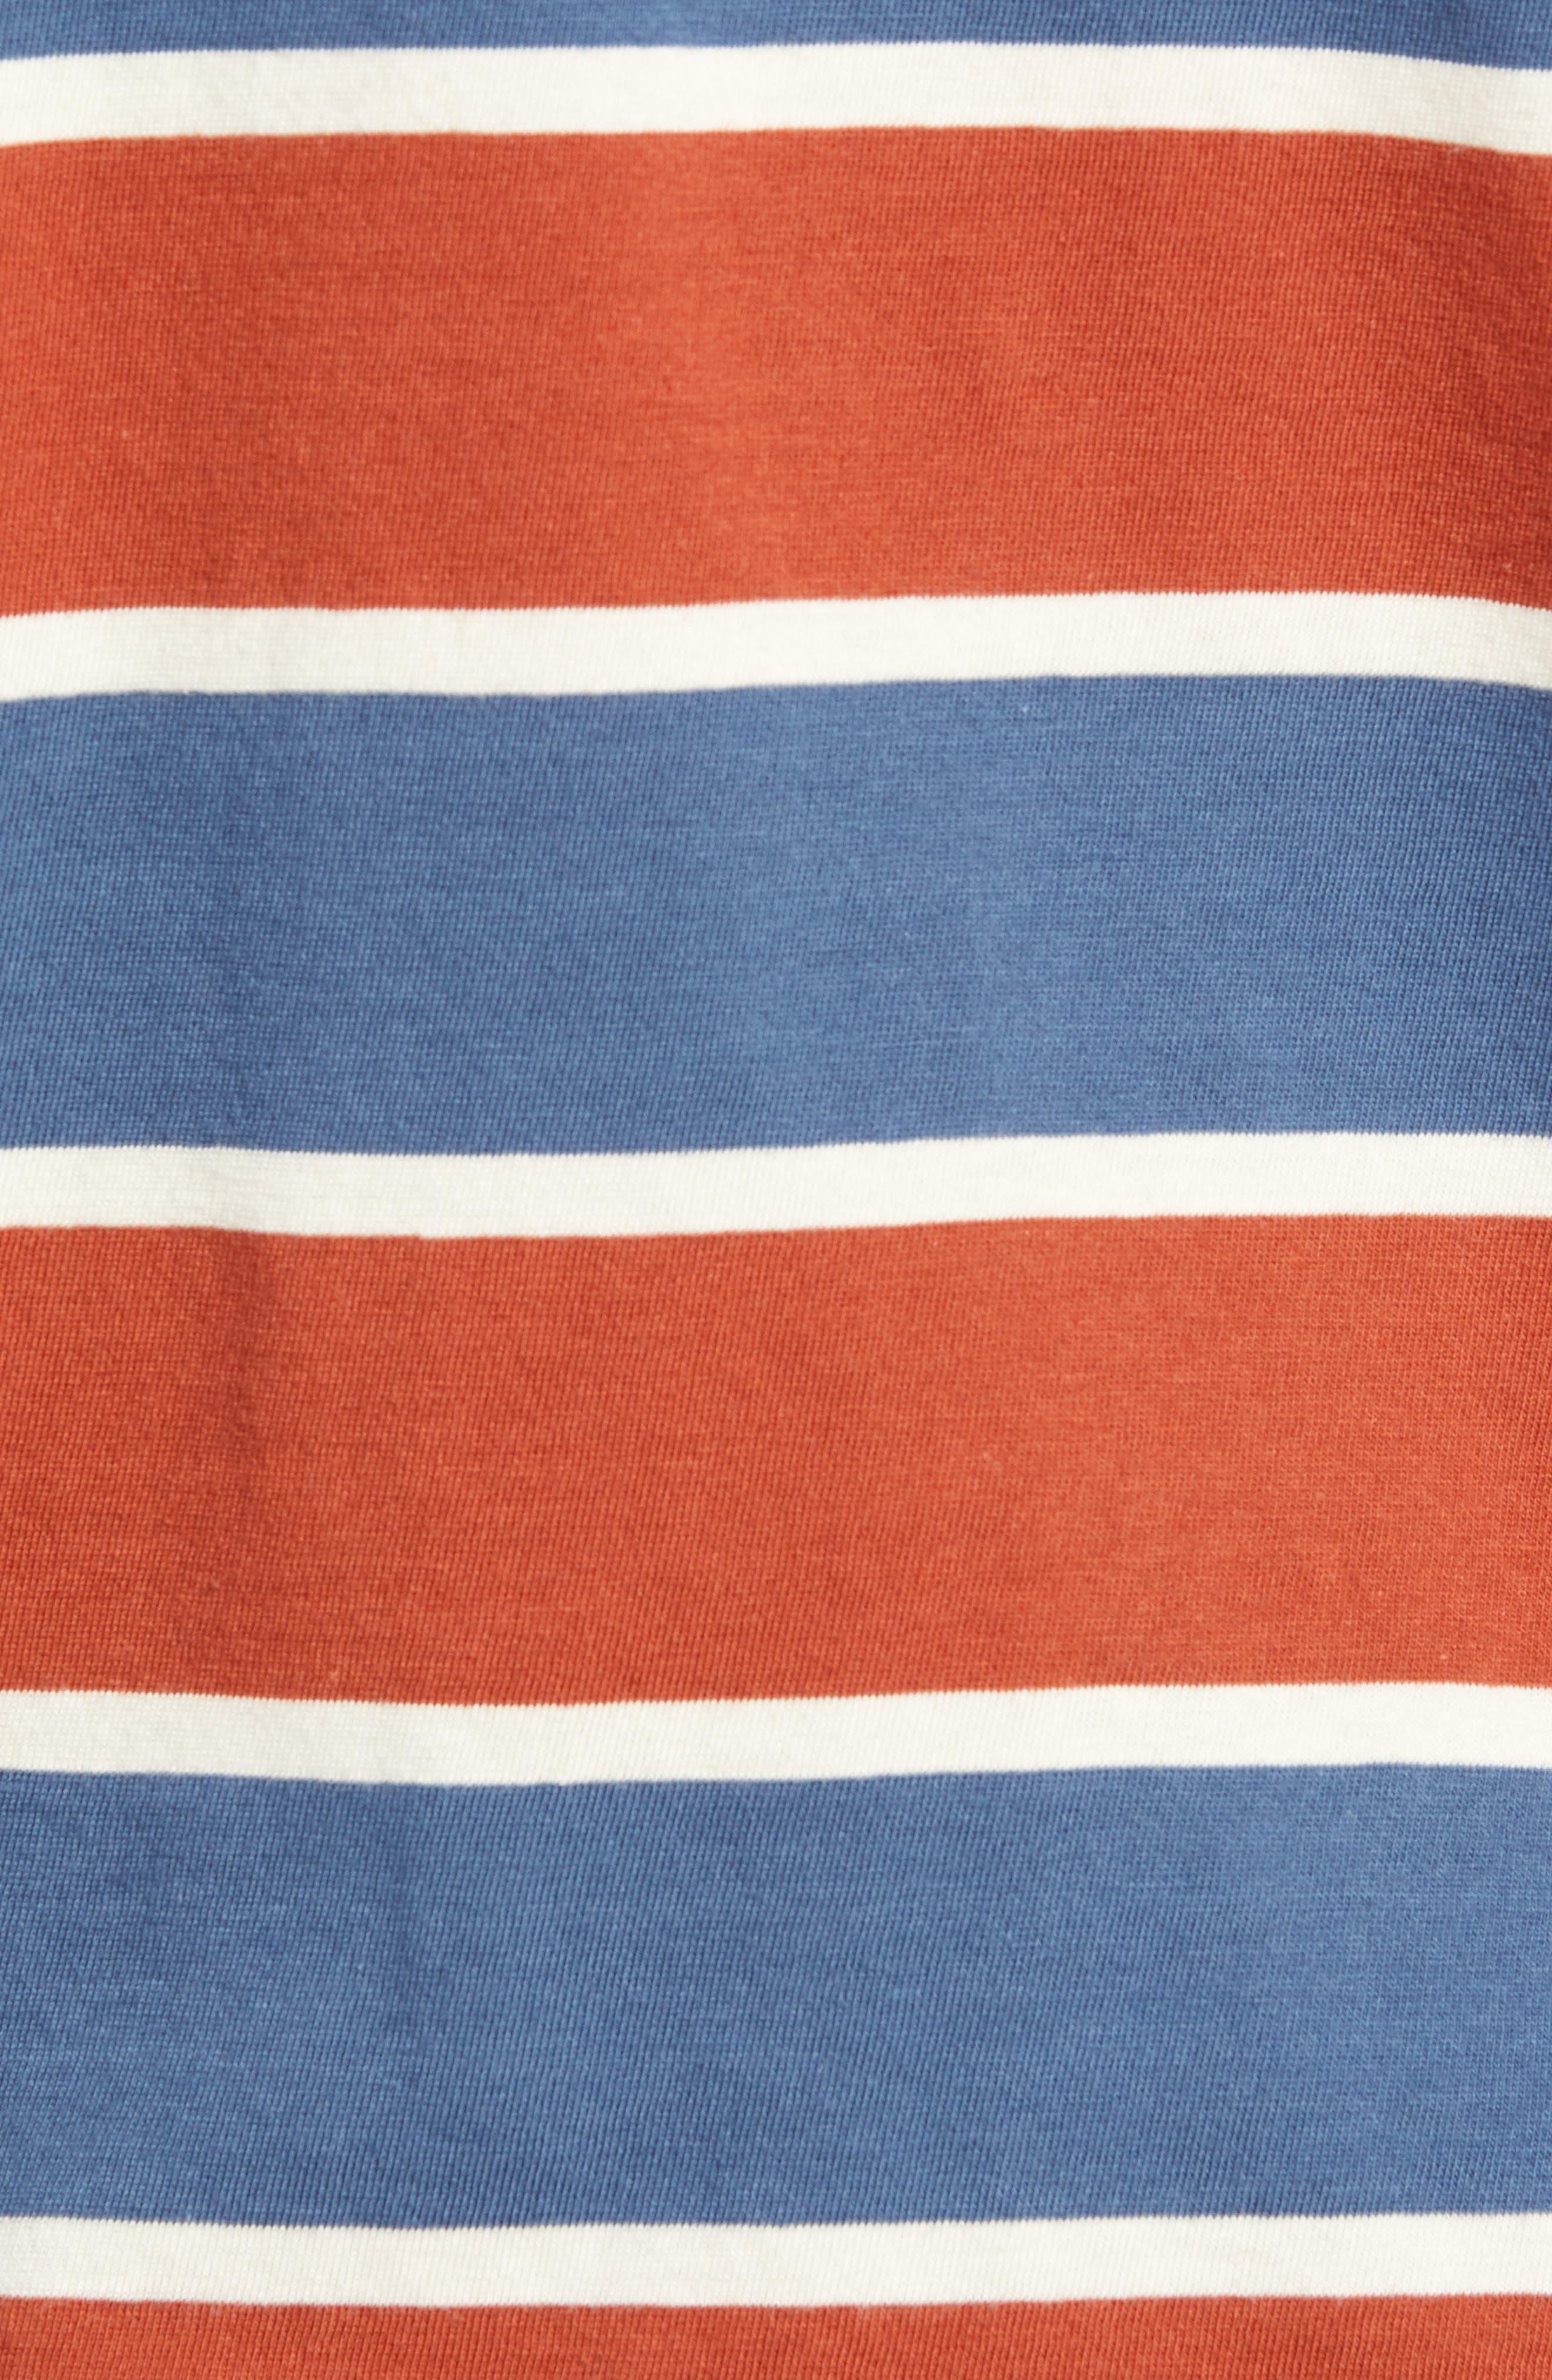 1960s Slim Fit Stripe T-Shirt,                             Alternate thumbnail 5, color,                             DARK DENIM MULTI STRIPE